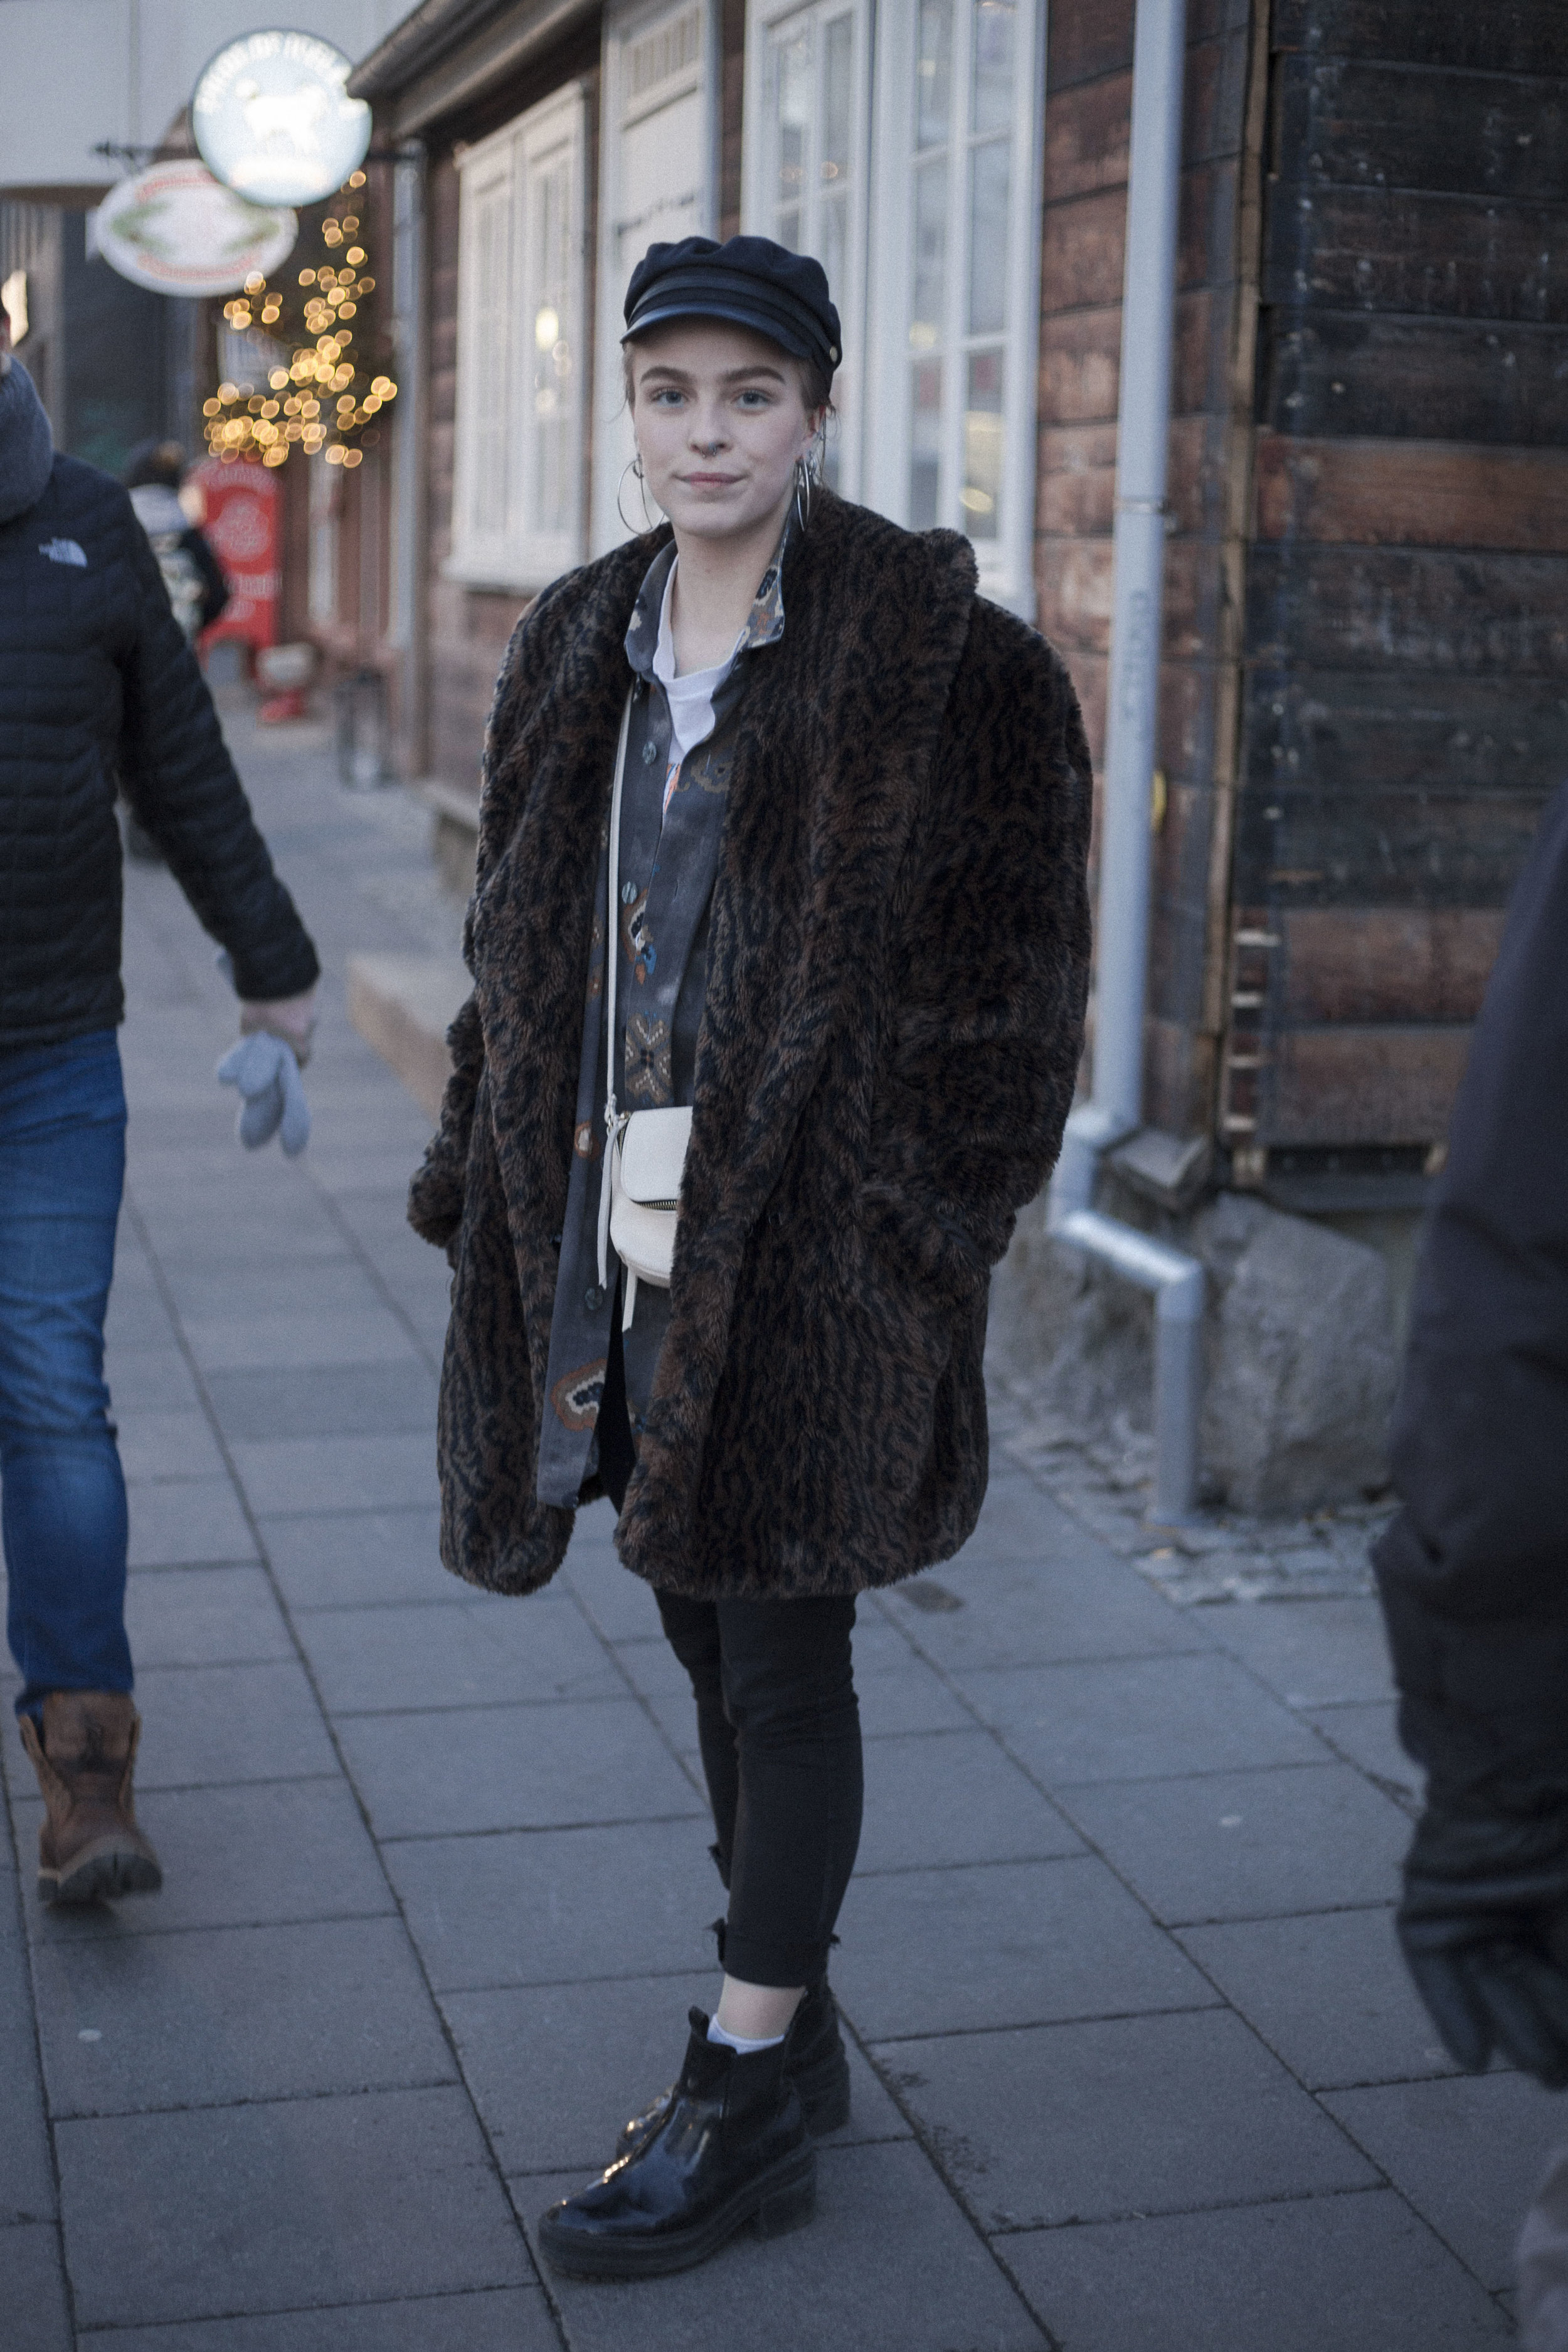 Stylish girl on the streets of Reykjavik in dress from Spuutnik Laugarvegur